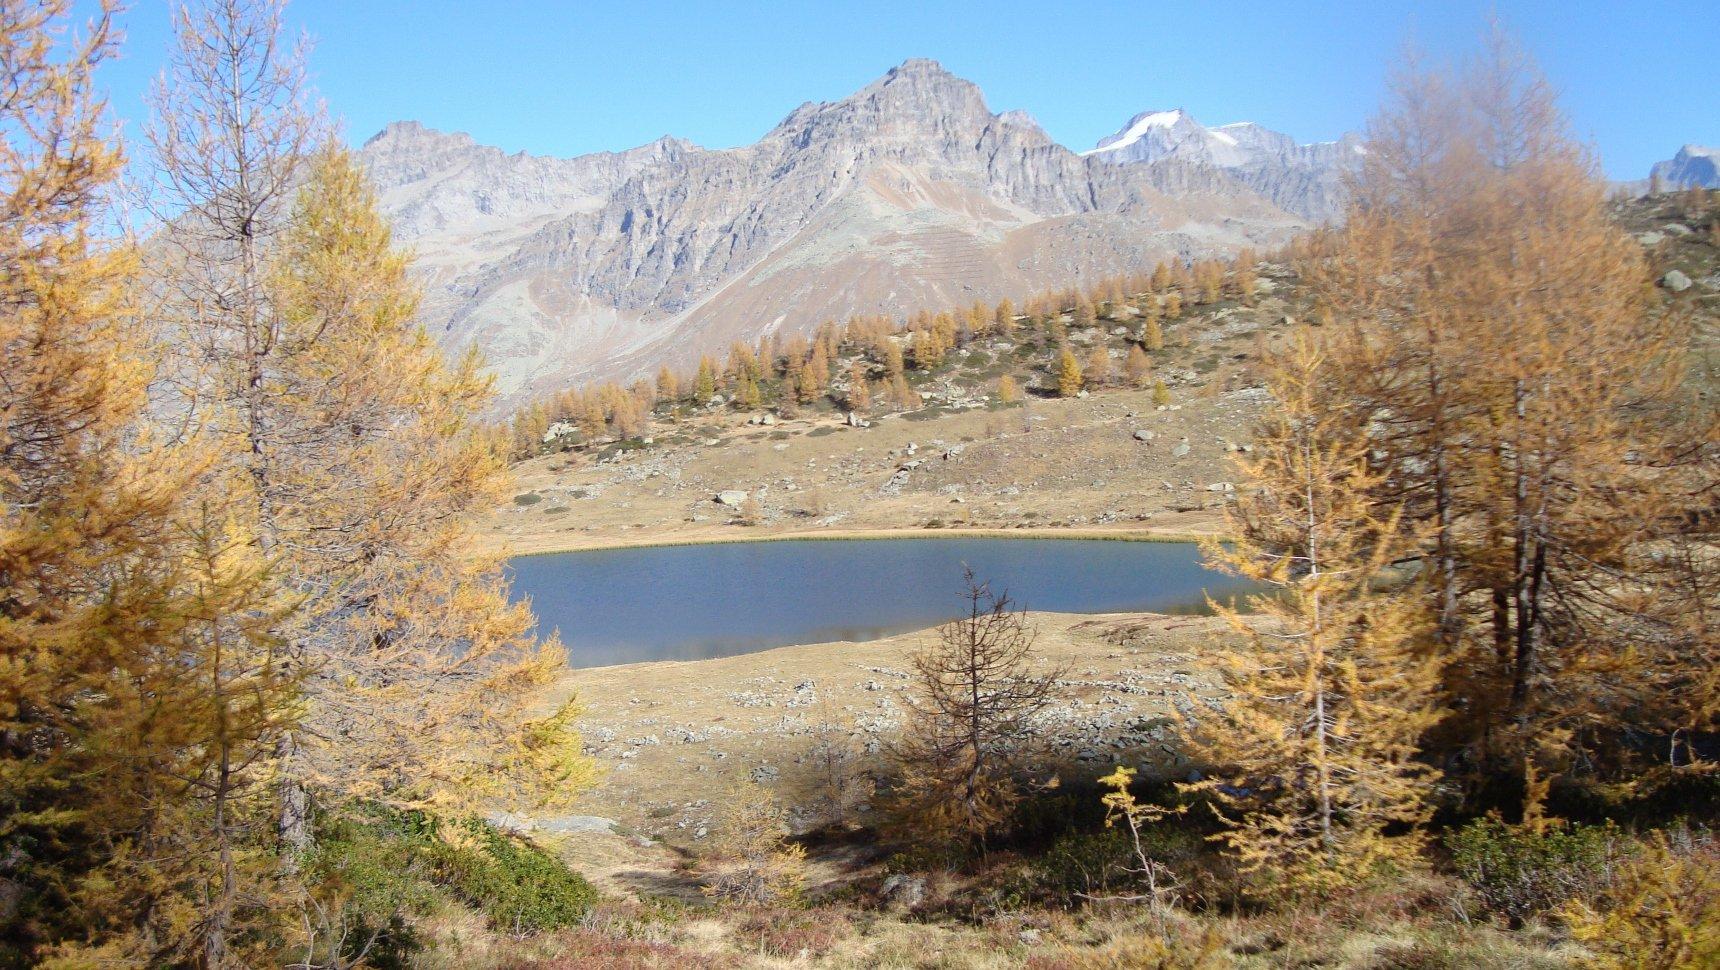 lago dres,sullo sfondo ciarforon e gran paradiso